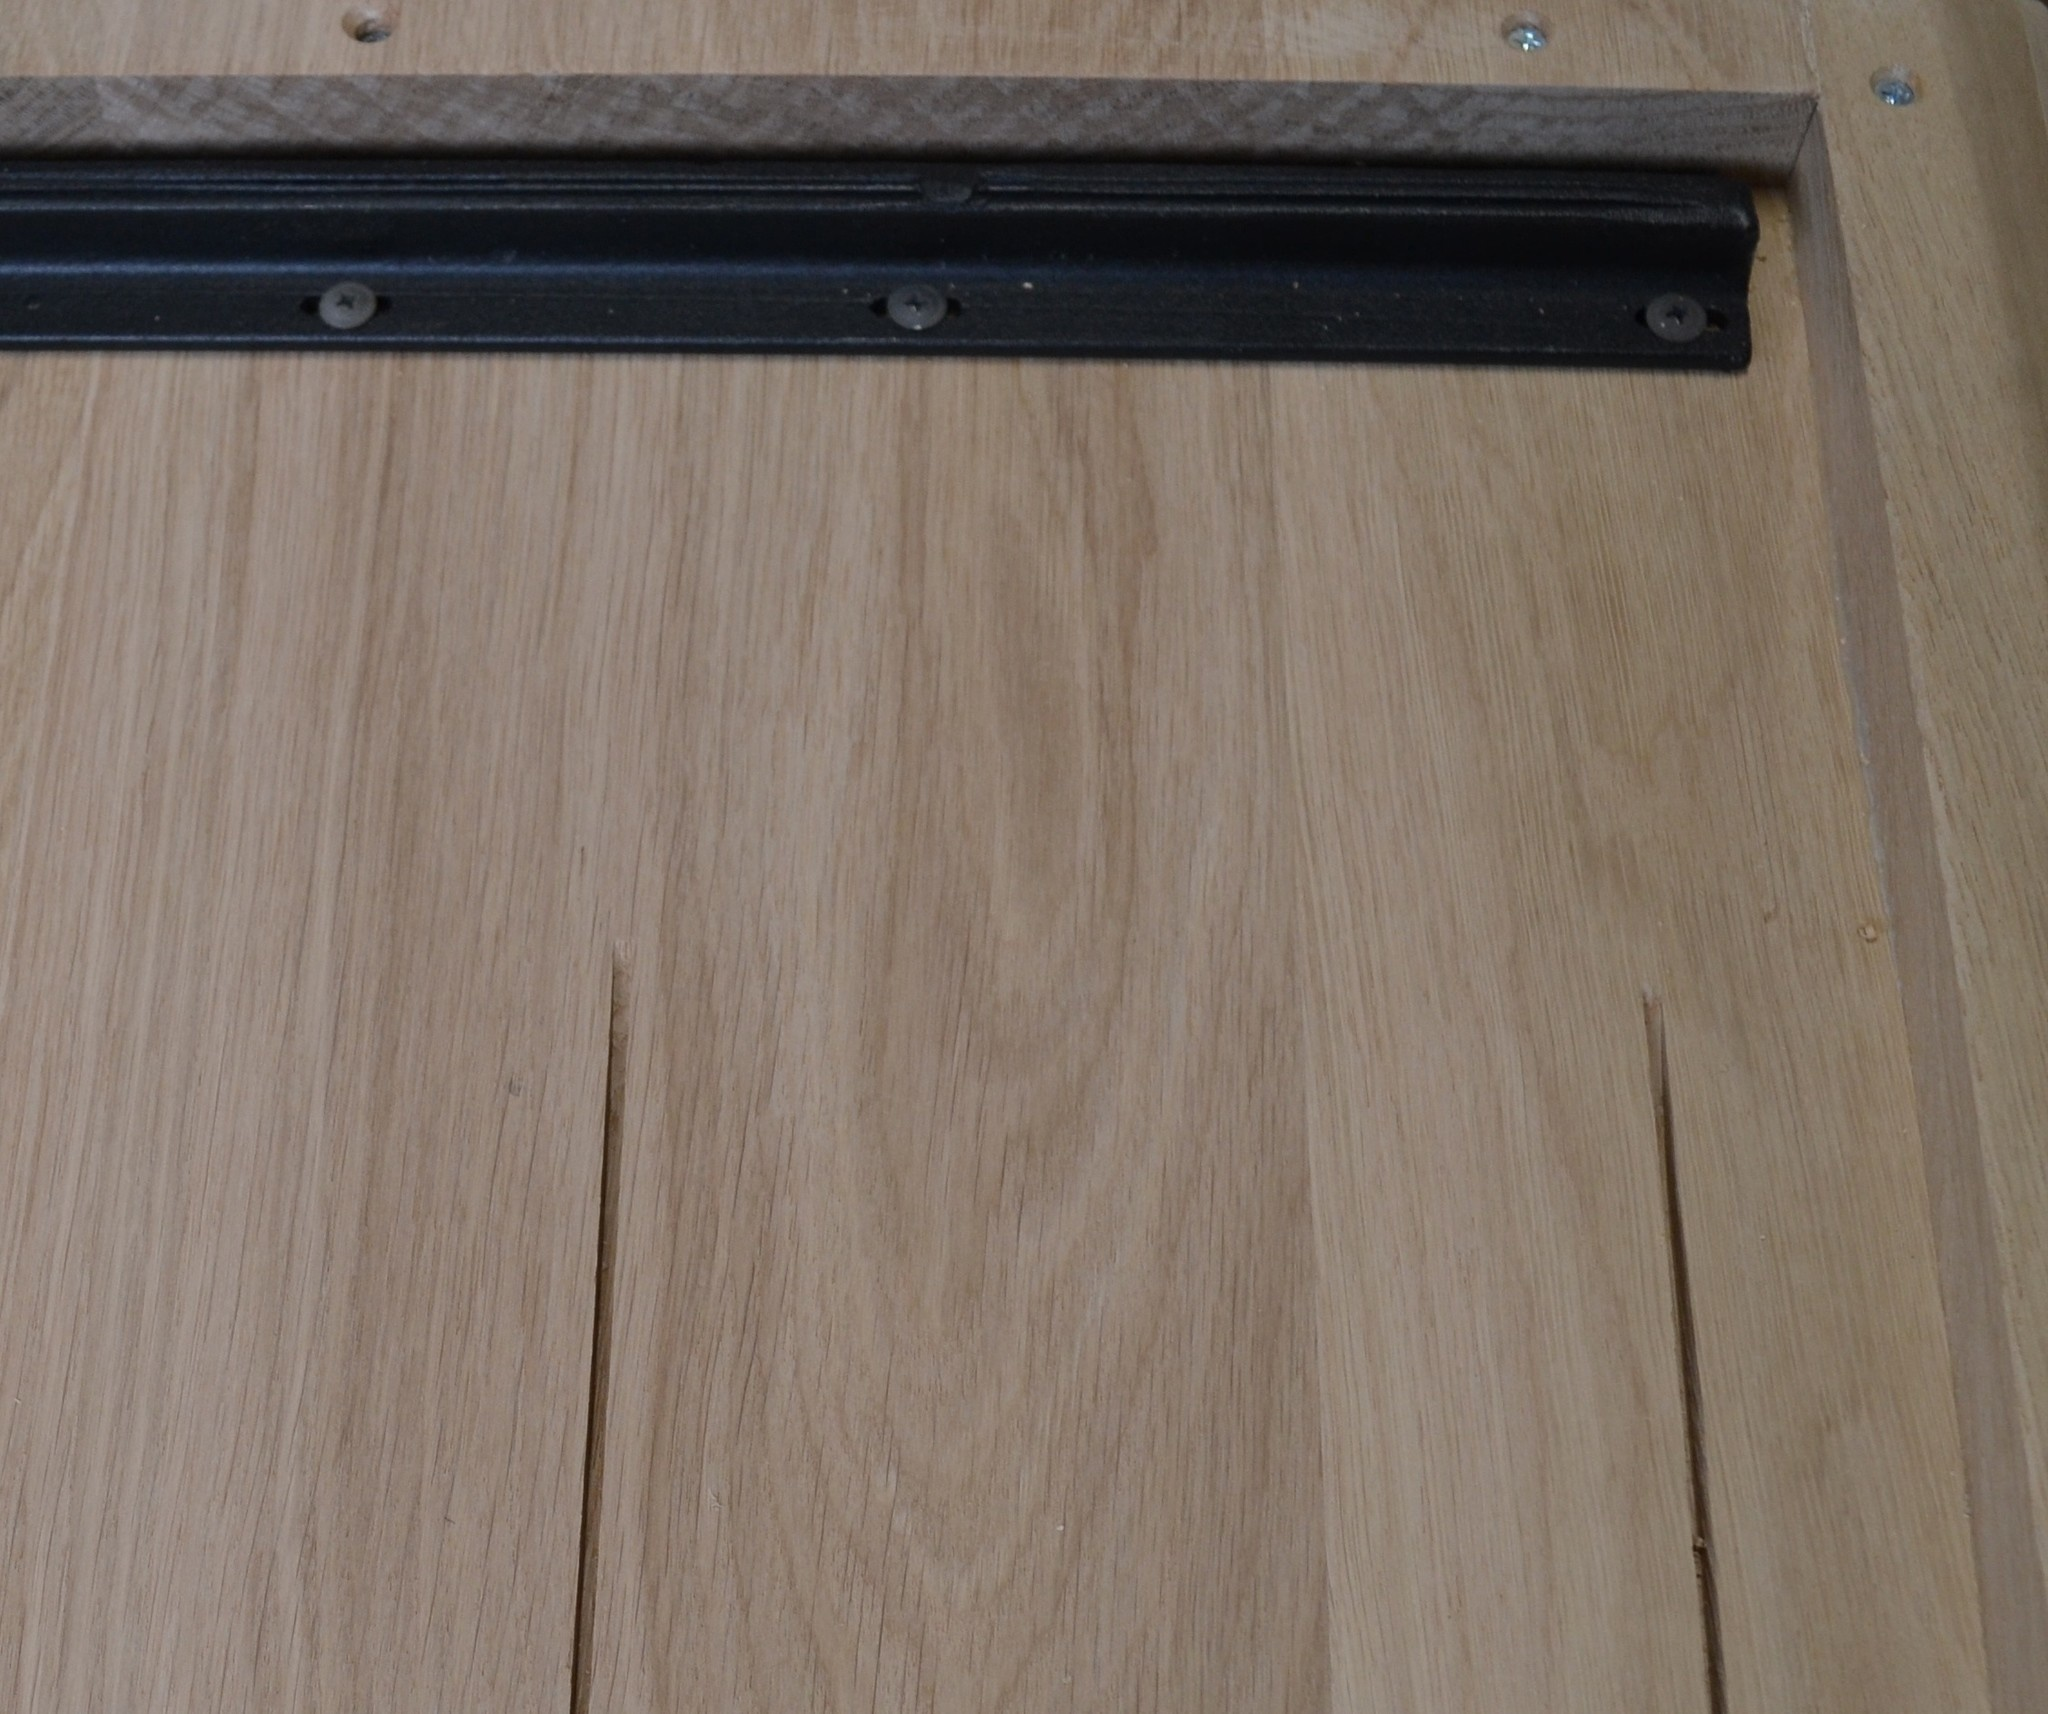 Eiken tafelblad - 8 cm dik (2-laags rondom) - diverse afmetingen - extra rustiek Europees eikenhout - verlijmd kd 10-12%